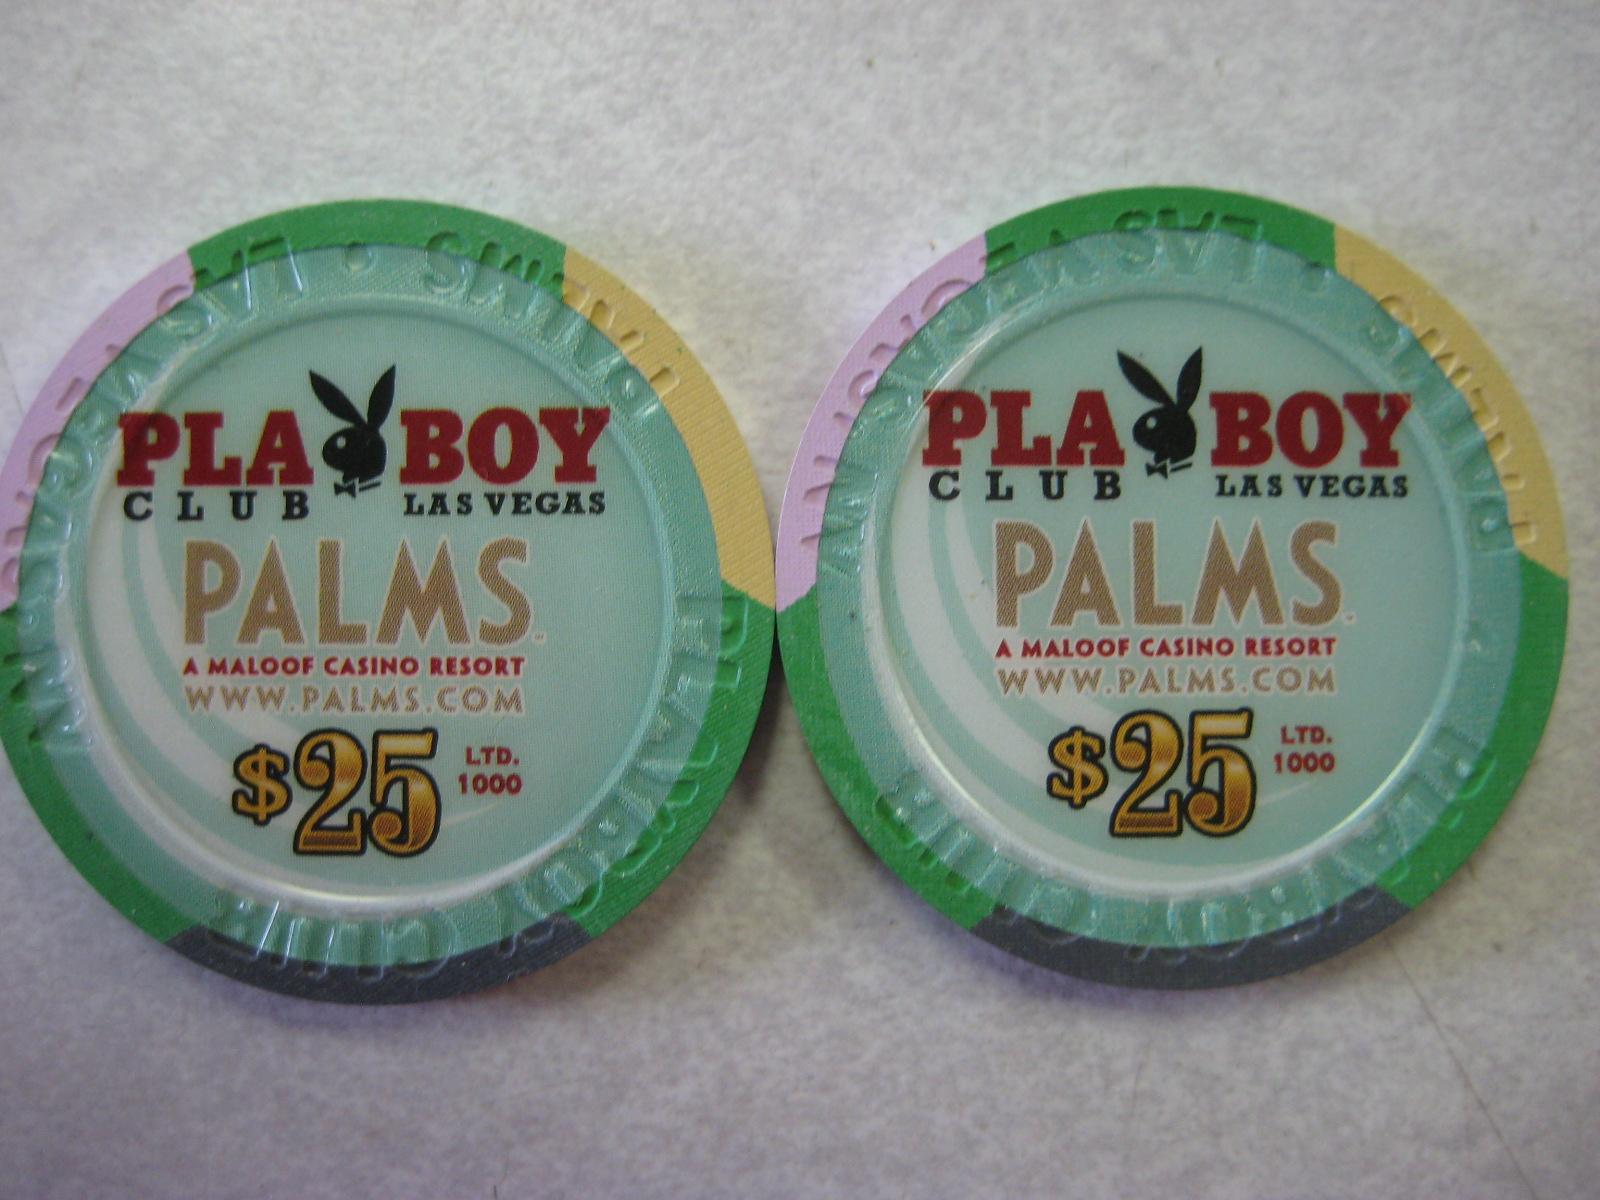 PMOY 2001 2002 $25 Chips Palms Playboy Club